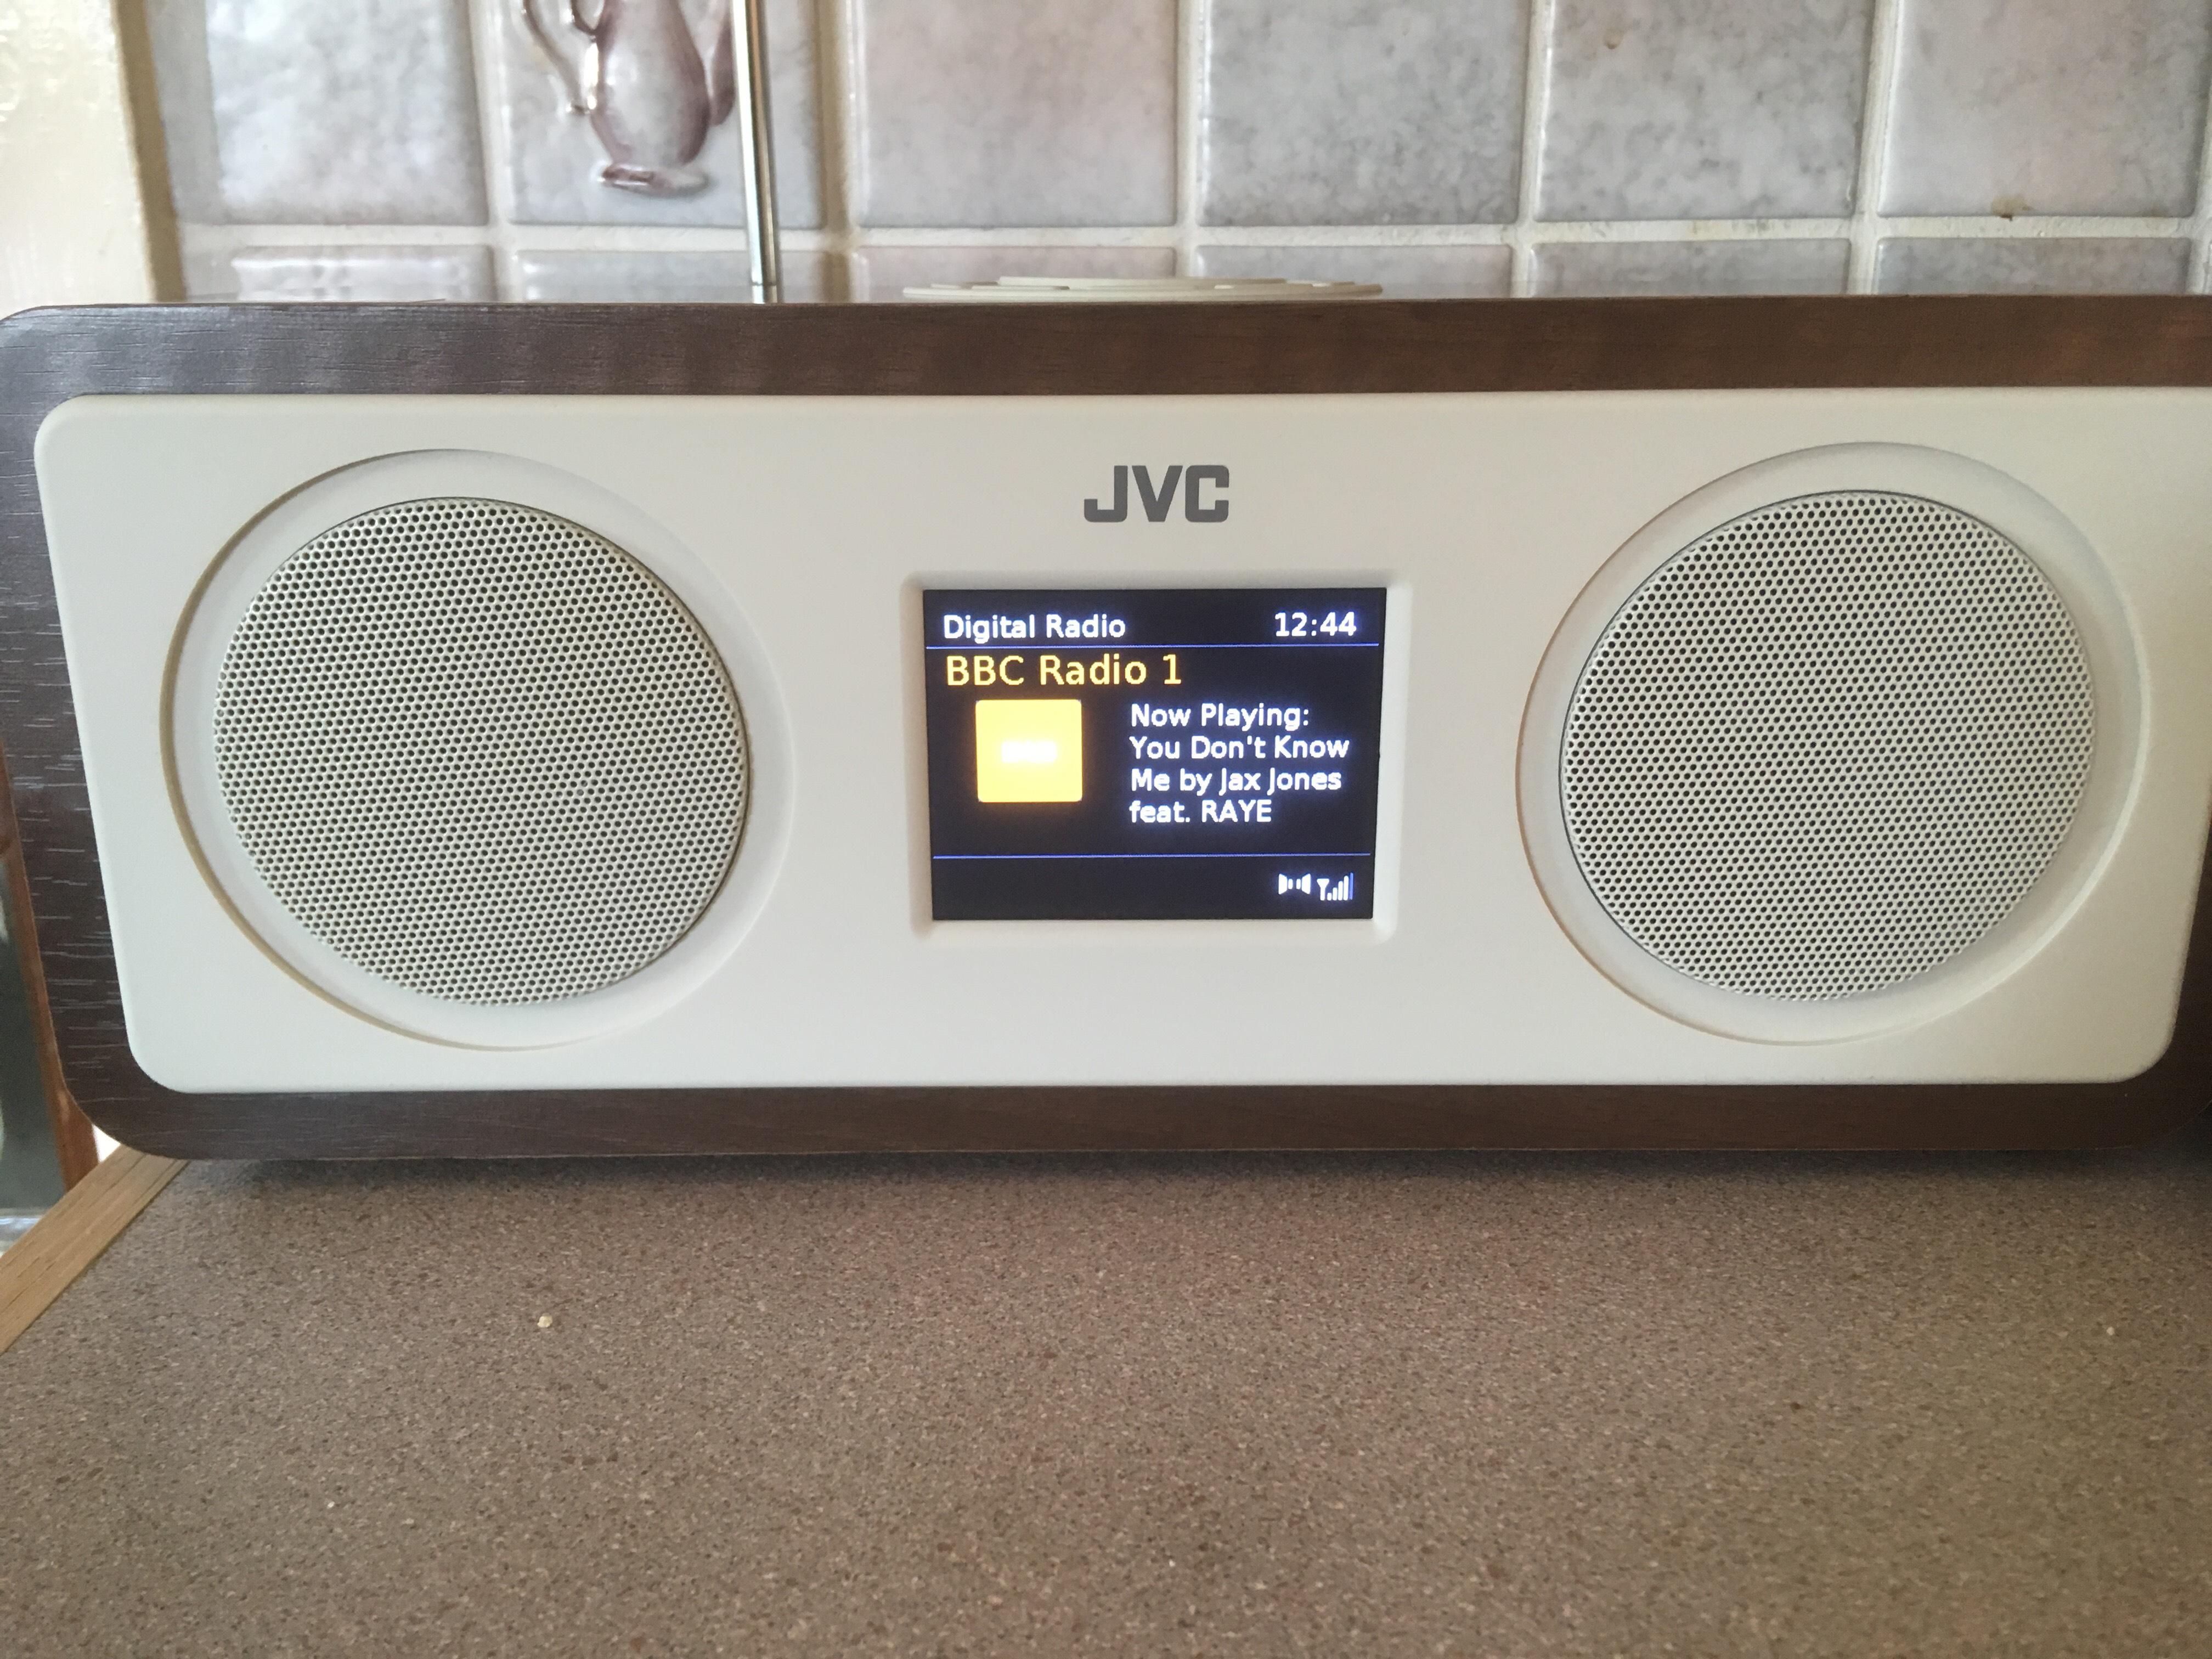 JVC RA-D77M DAB+/FM Bluetooth Radio - Wood & Cream - £39.99 @ Currys